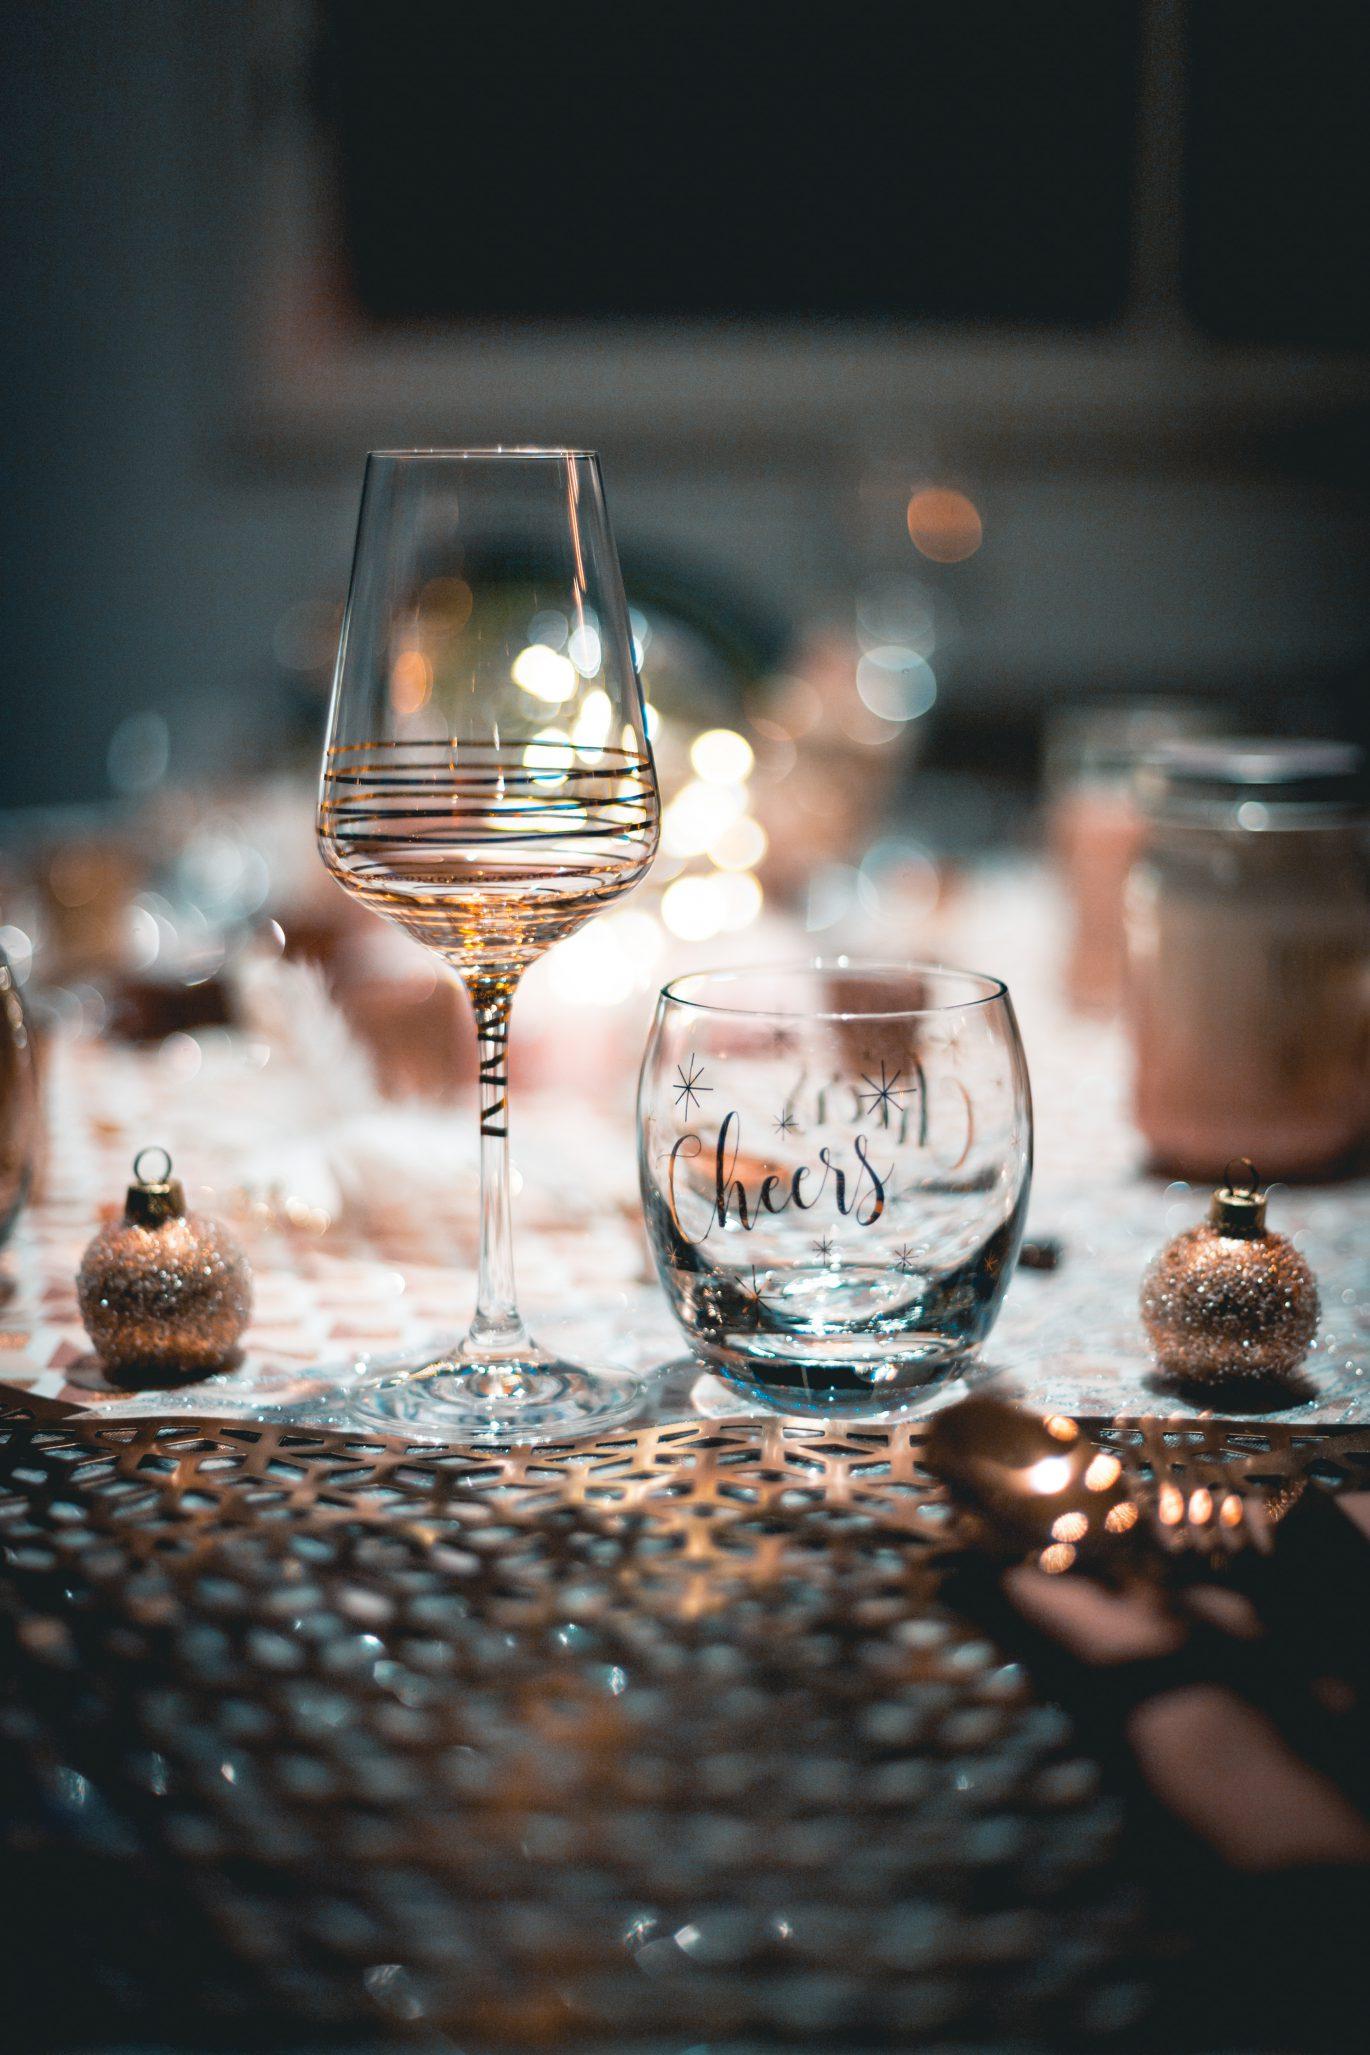 New Year, New Year's Eve, Christmas Dinner, Cheers, Wine Glass, Celebration, Festivity, Downtown Winnipeg